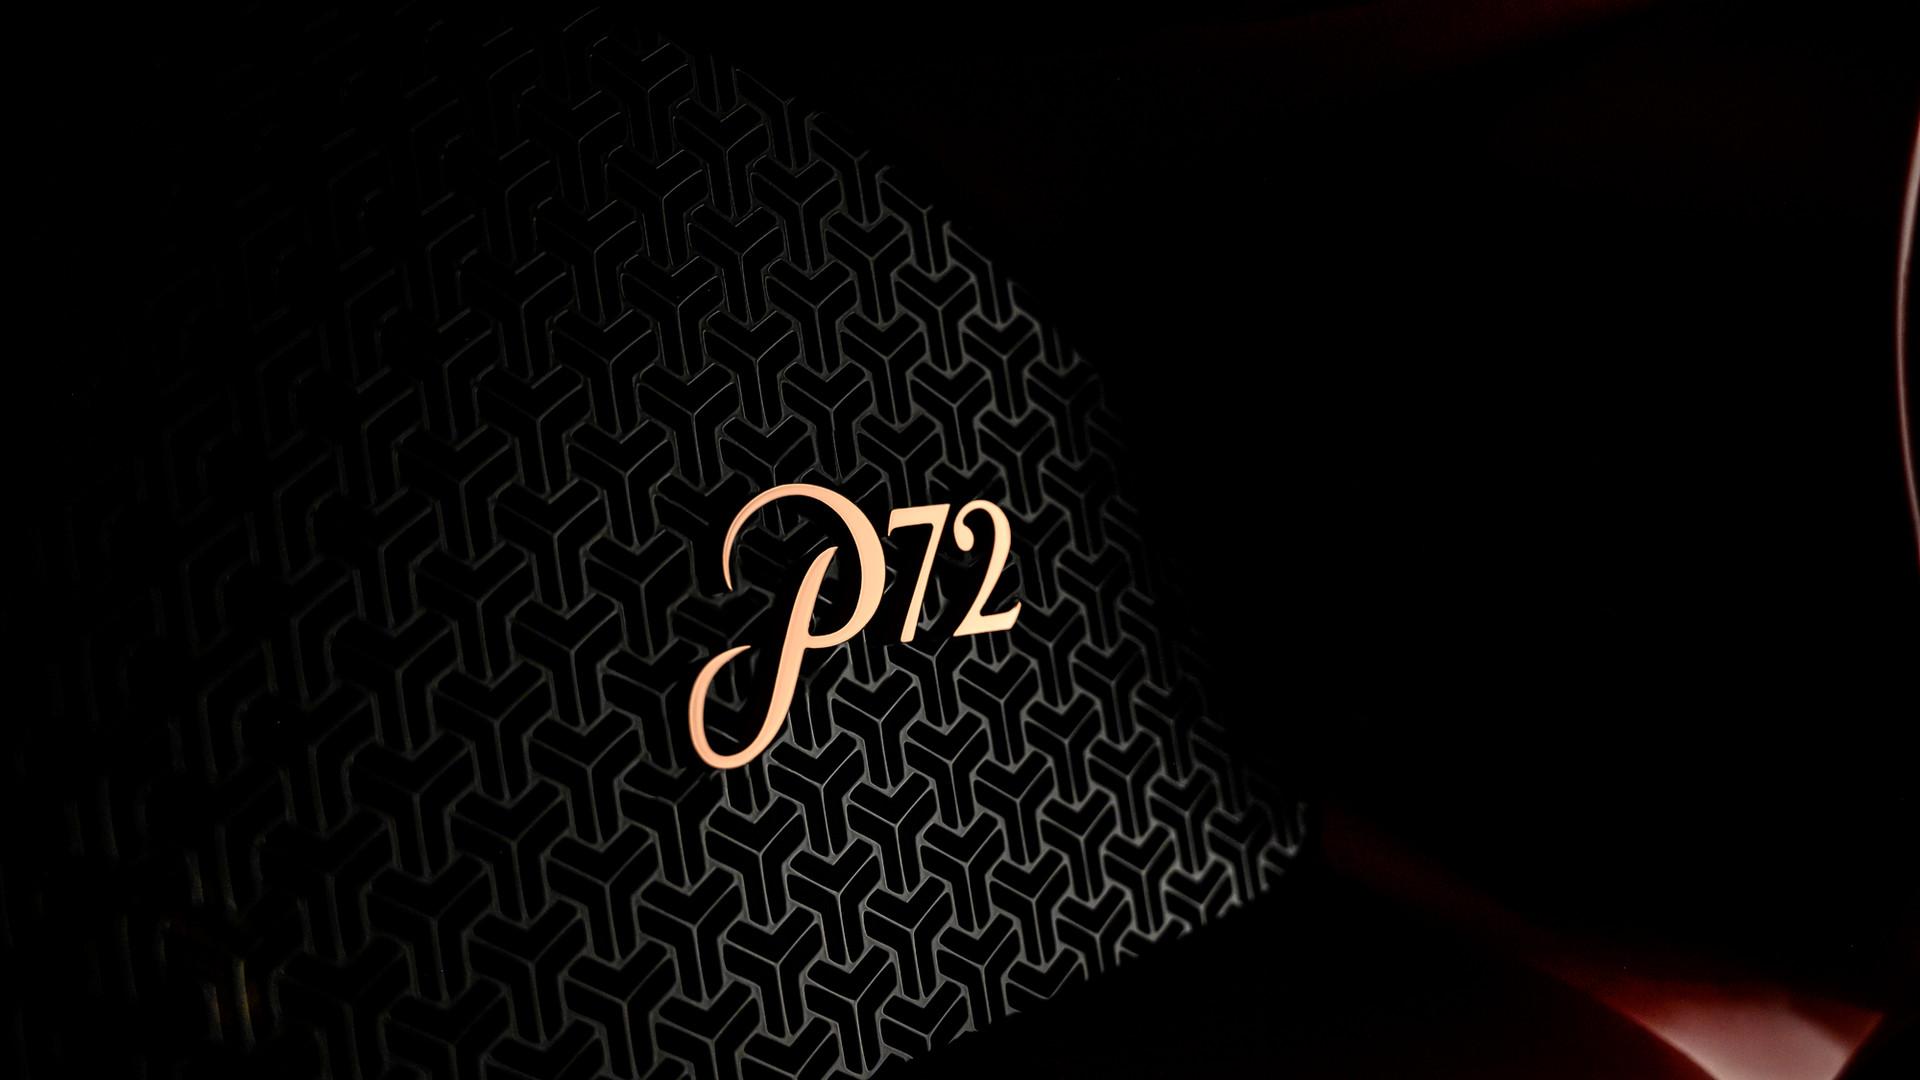 detomaso p72